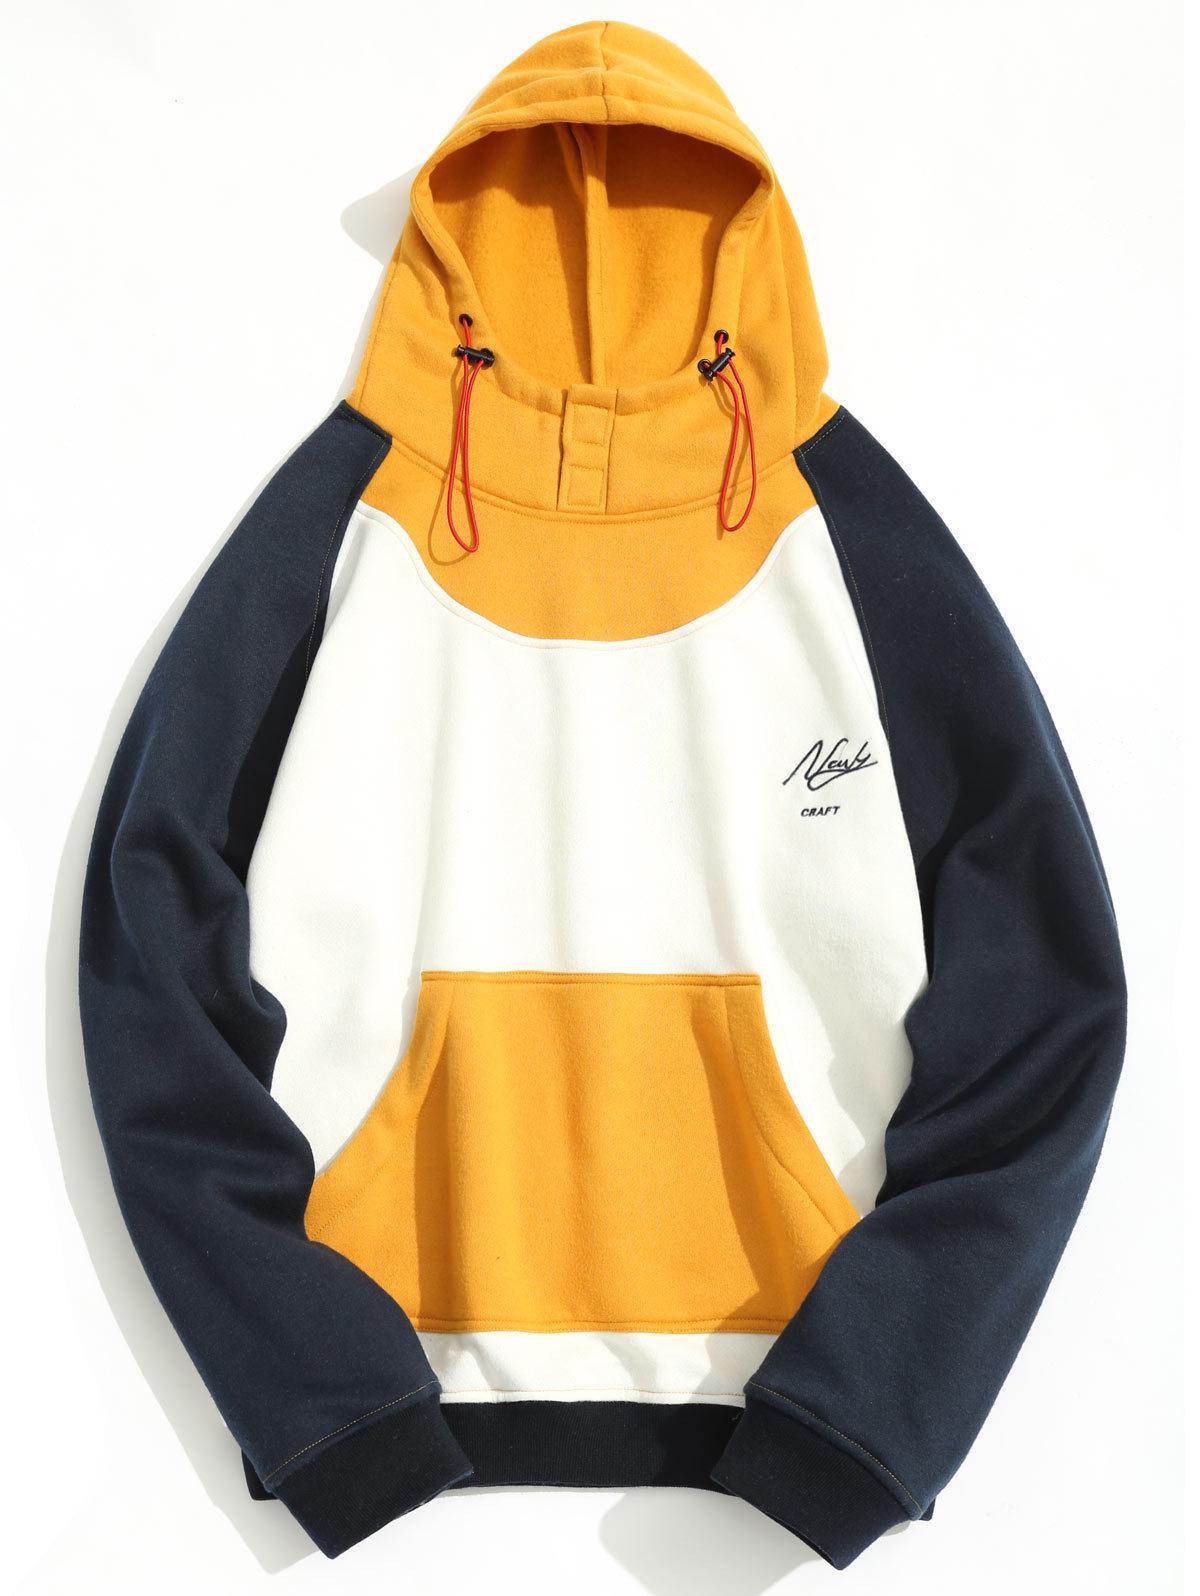 Spring Autumn Color Block Men Fleeced Hoodies Kangaroo Pockets Casual Sweatshirts Male Pullover Fashion Outwear Tops Free Shipping